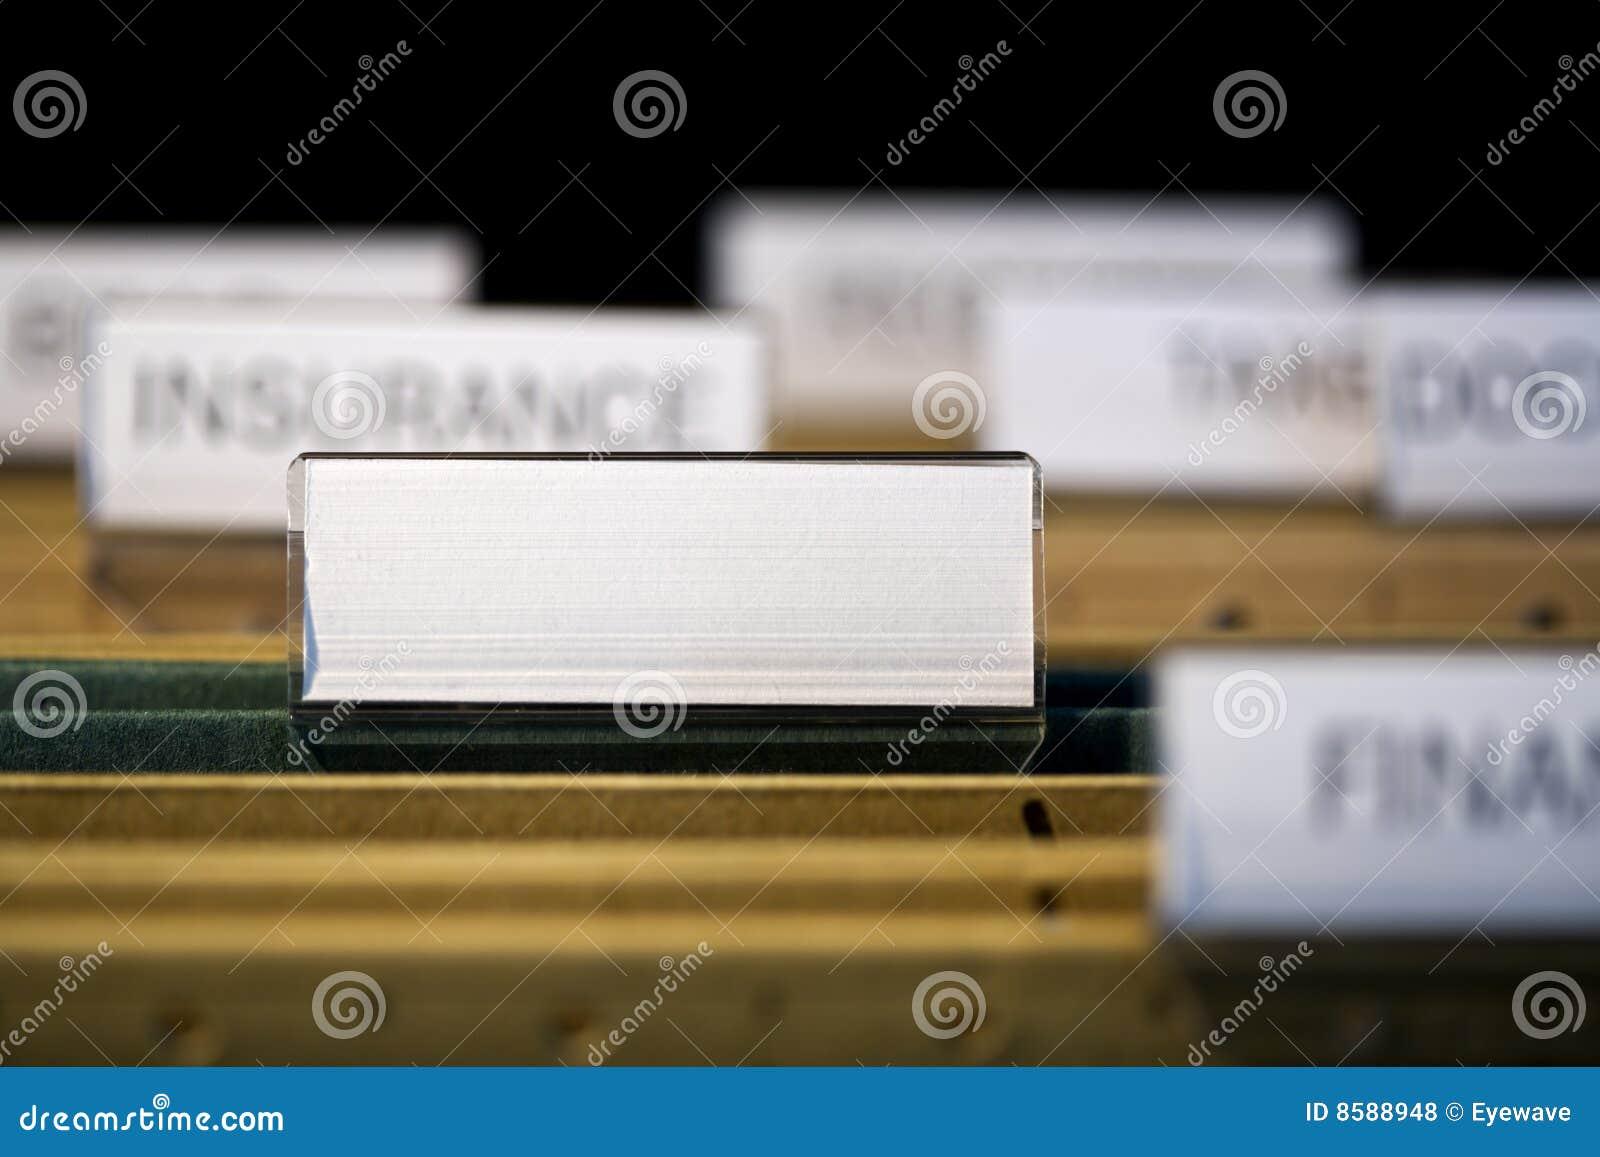 Pustego gabinetowego kartoteki segregowania skoroszytowa etykietka